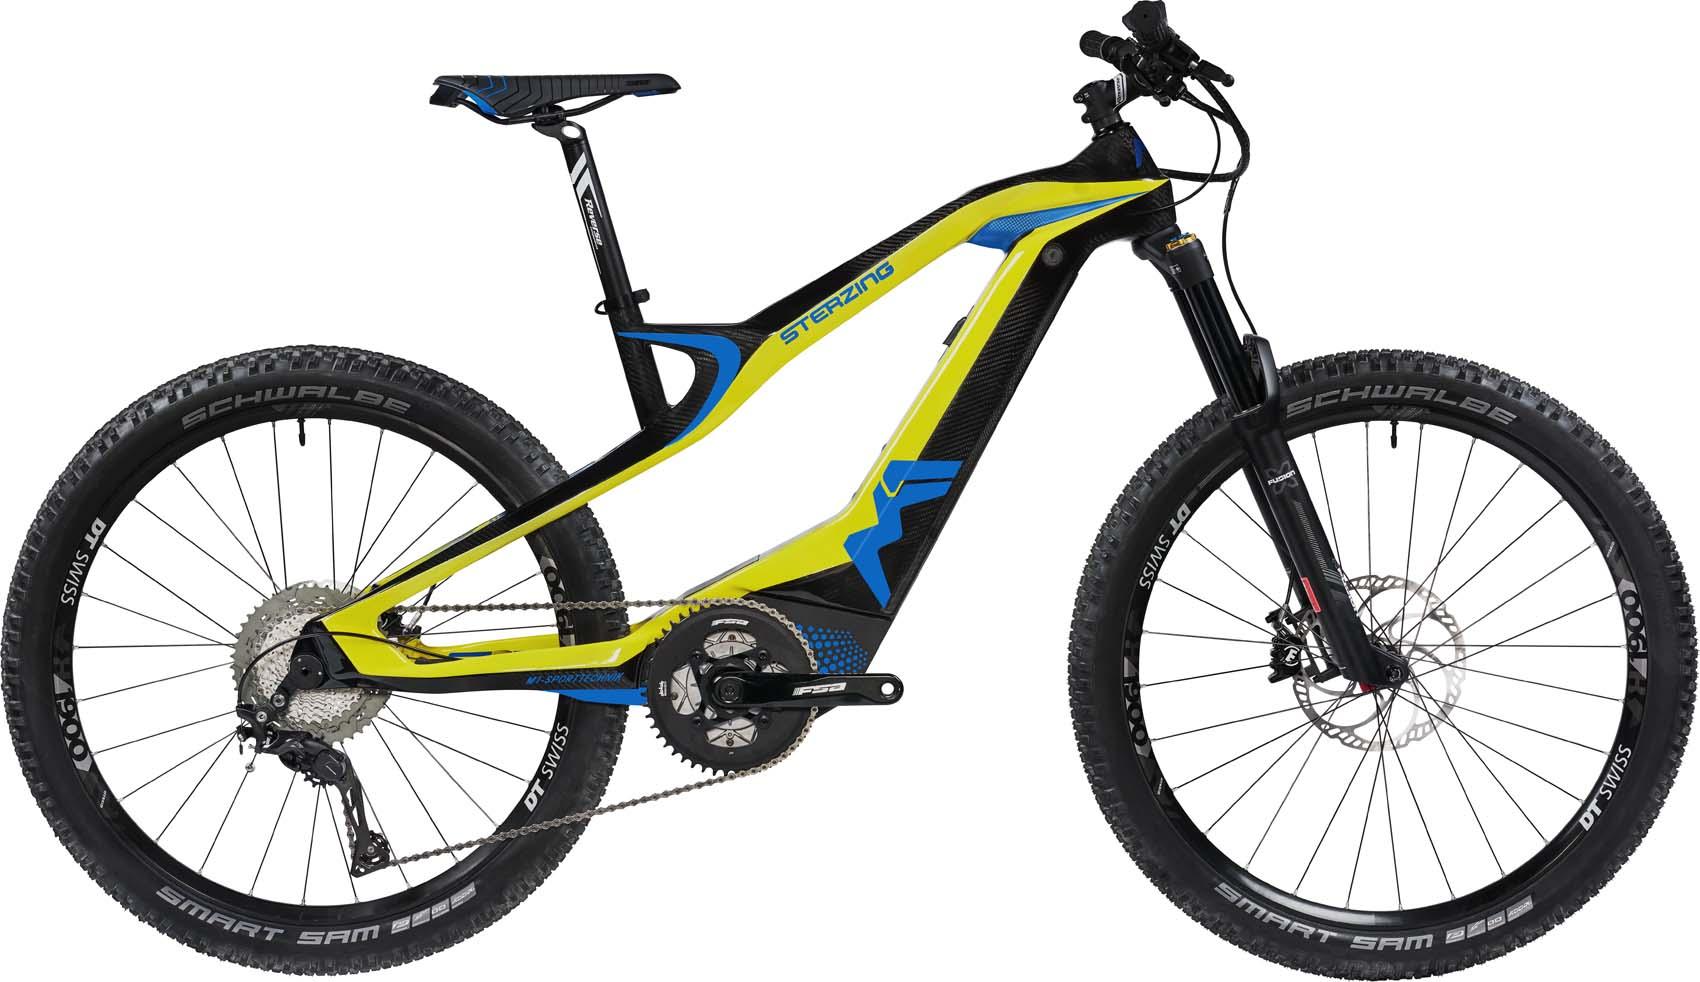 M1 Sterzing Evolution R-Pedelec 2020 - limoncello yellow/carbon